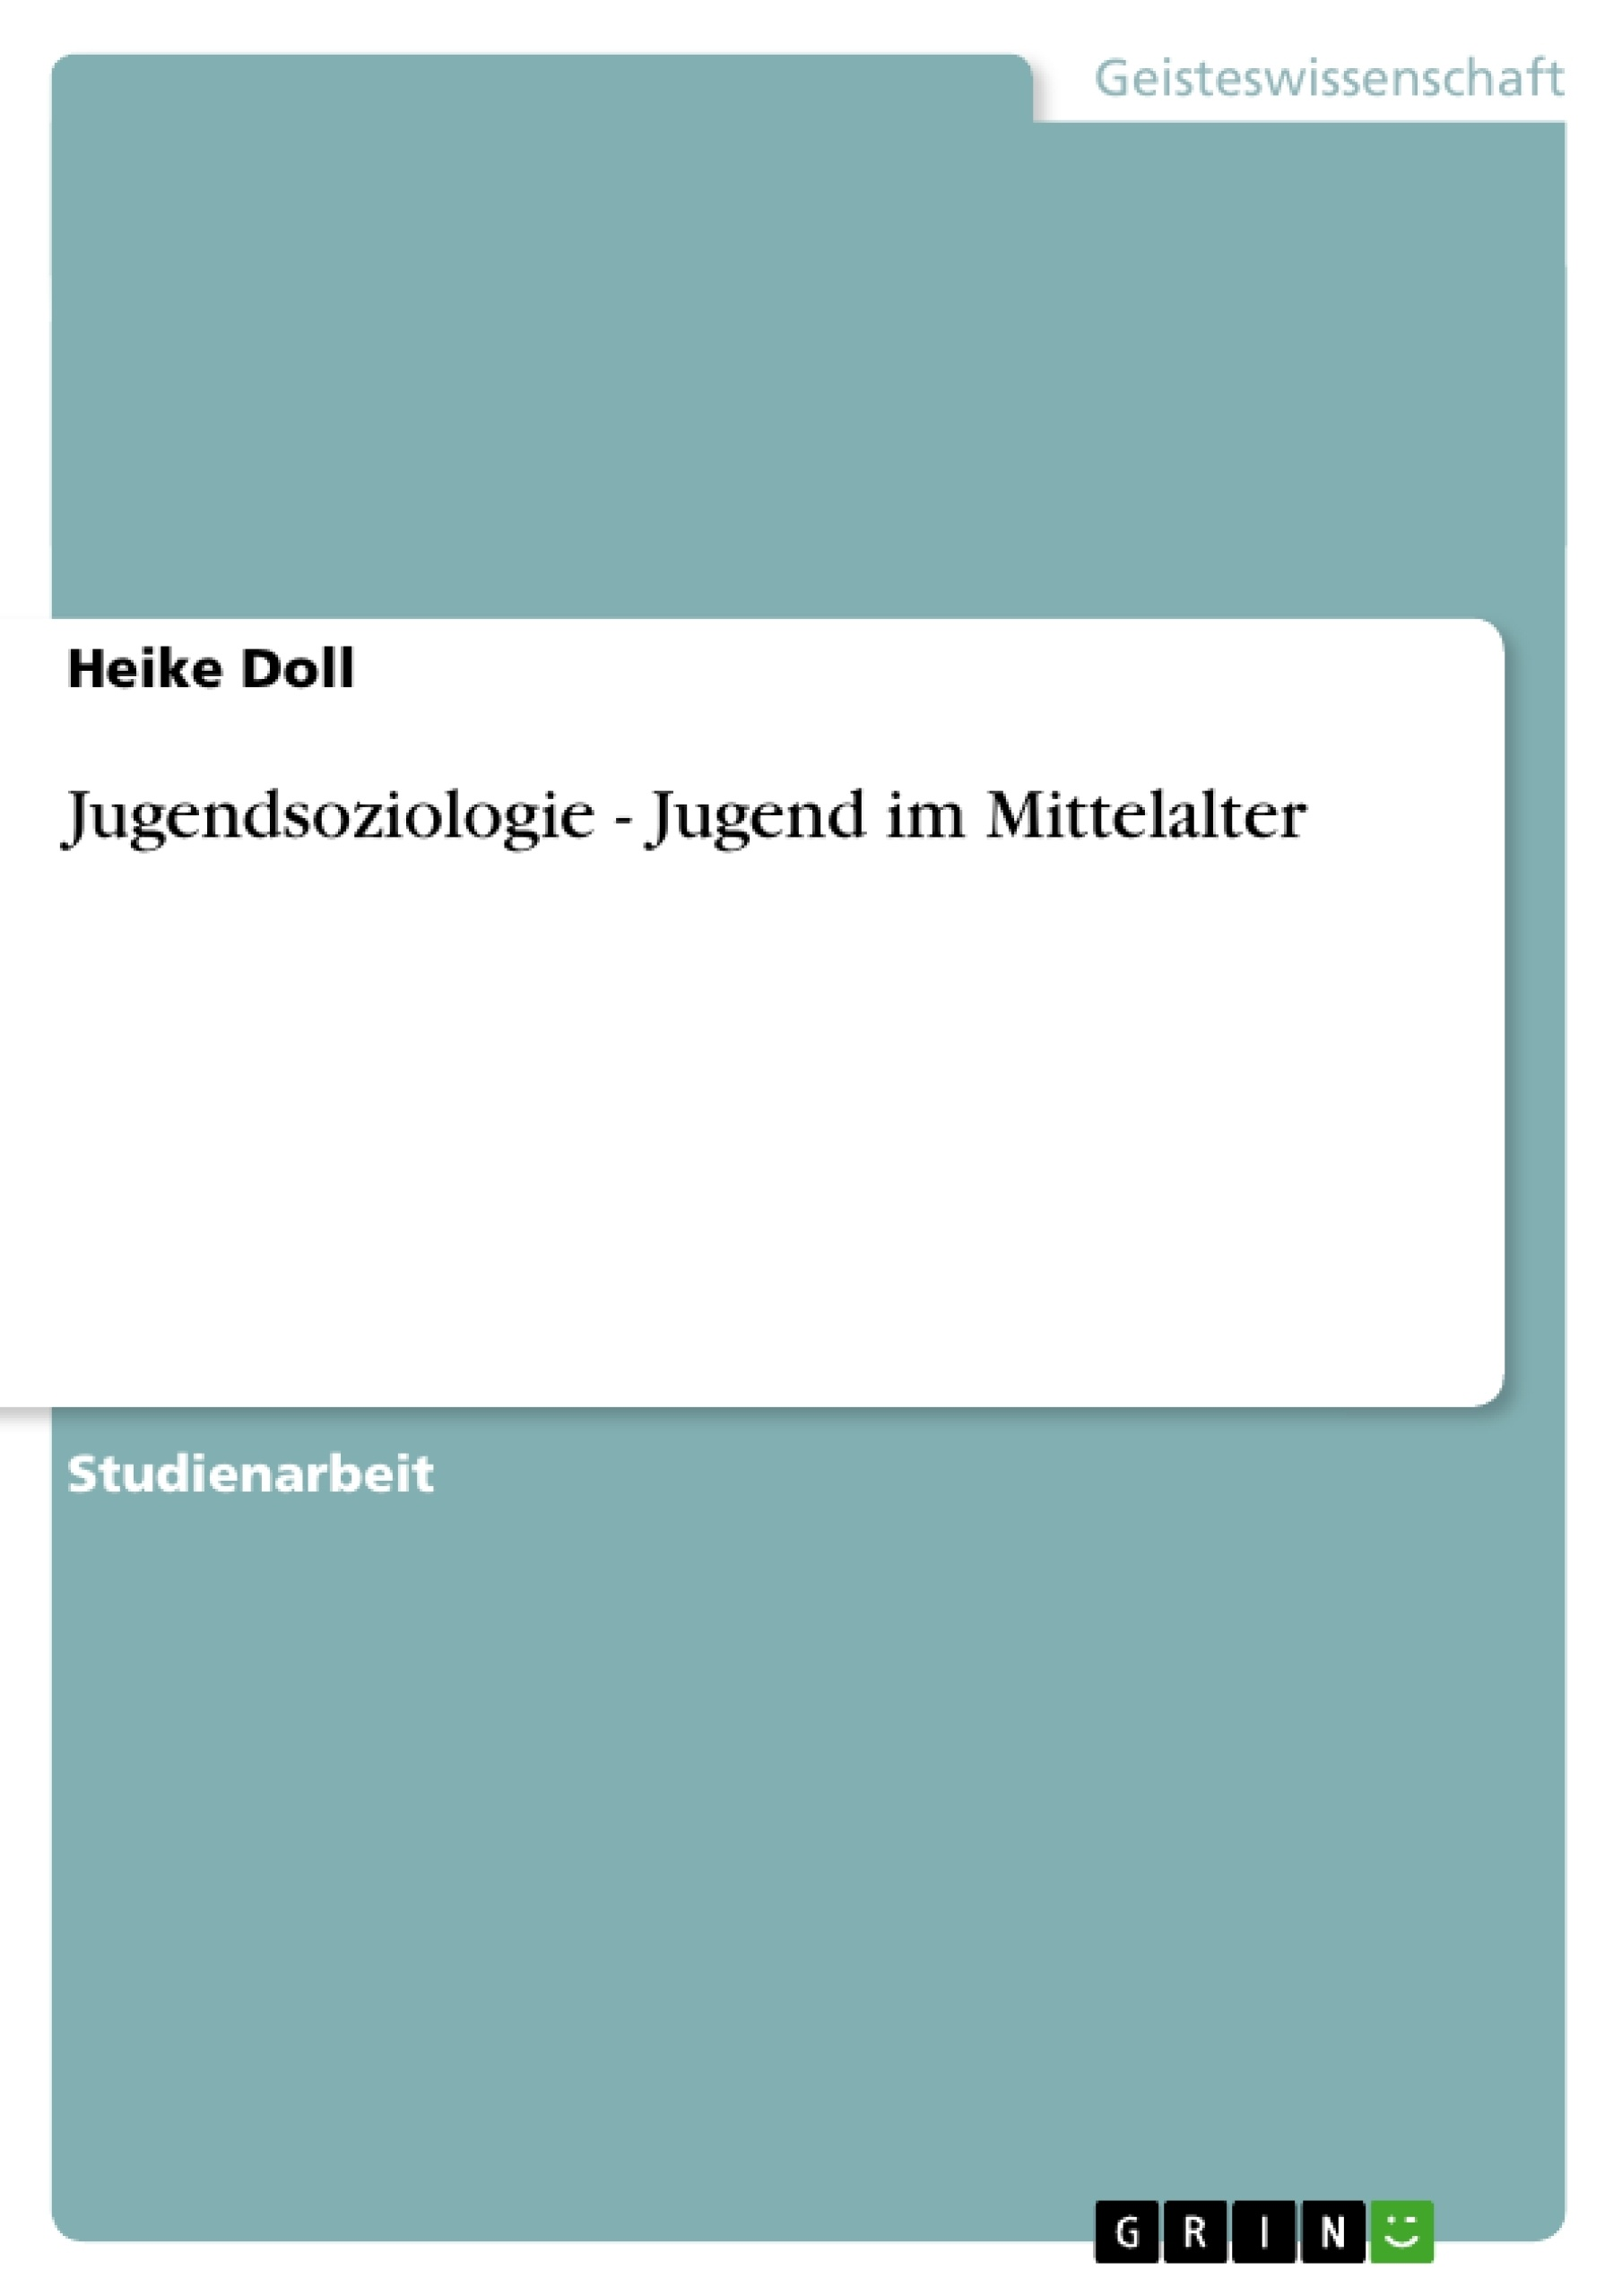 Titel: Jugendsoziologie - Jugend im Mittelalter